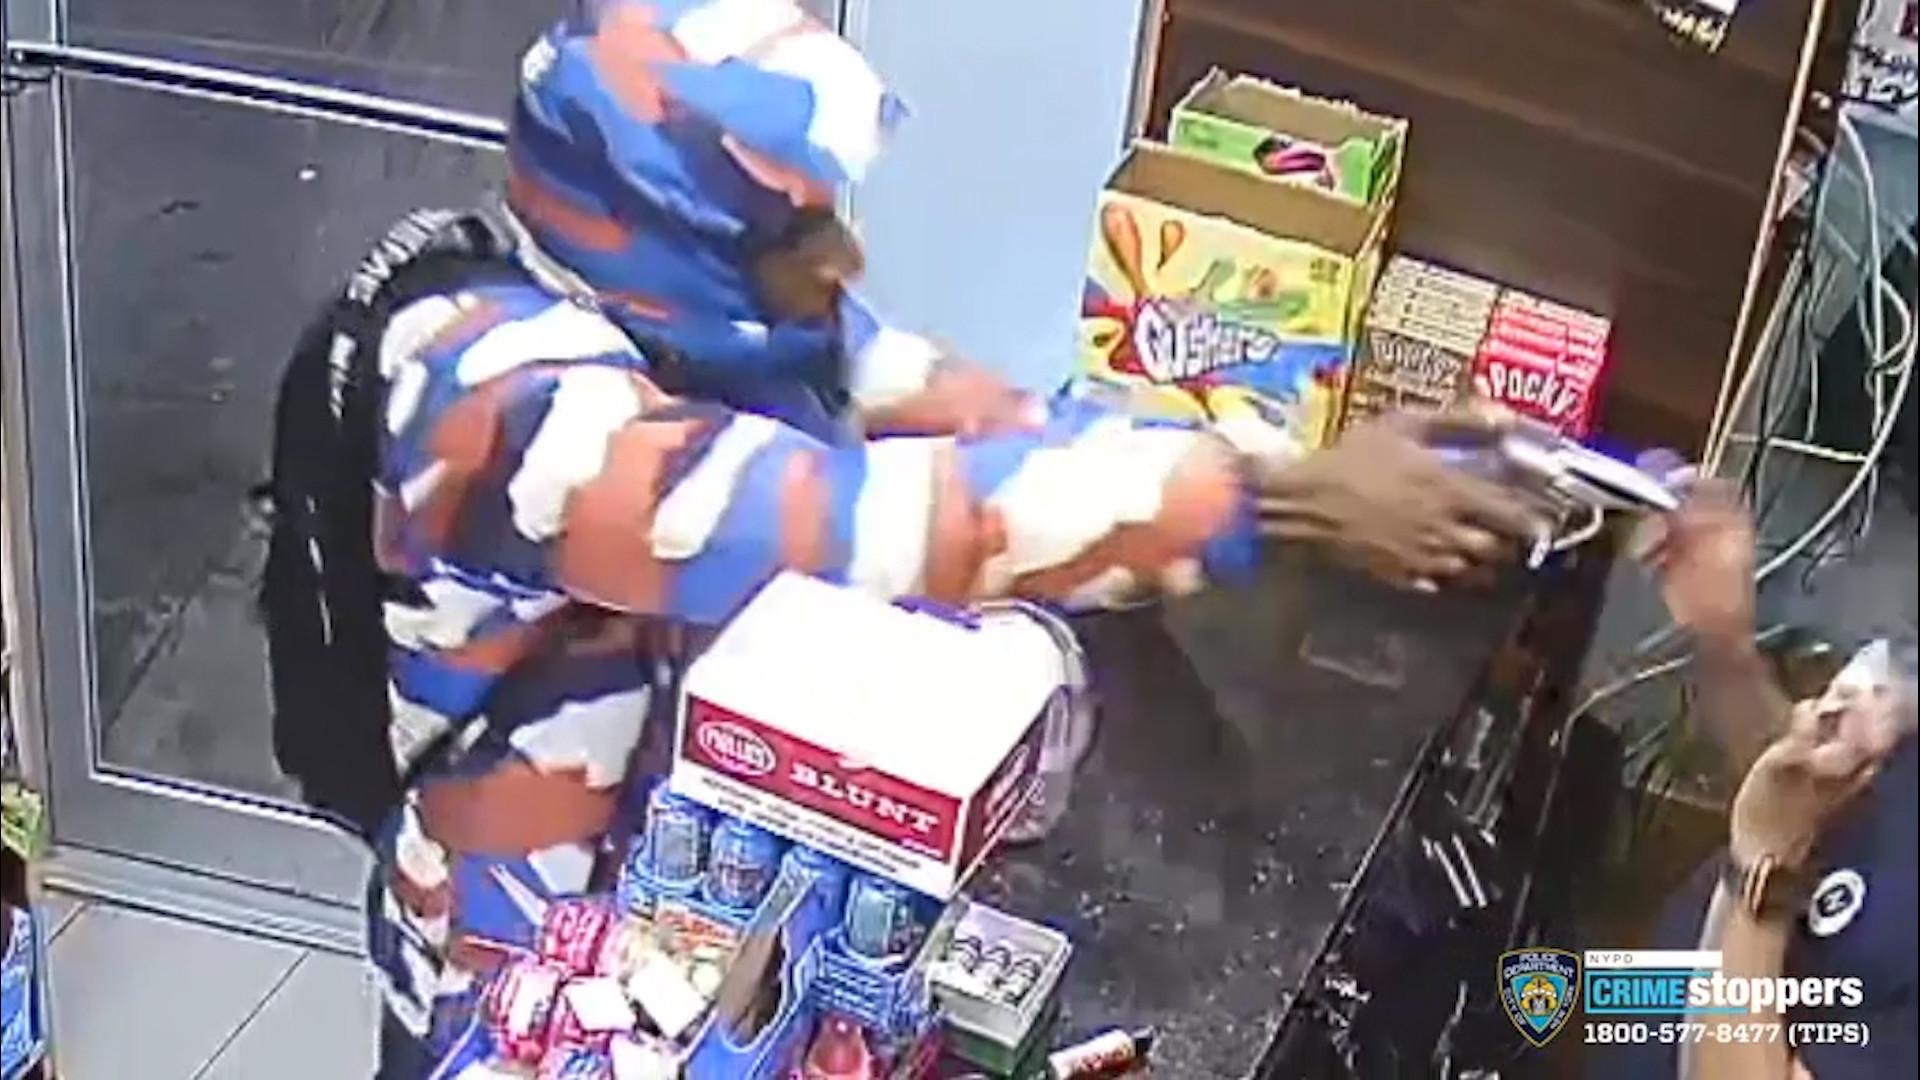 SEE IT: Crooks pull guns, pistol-whip victim during Brooklyn robbery spree